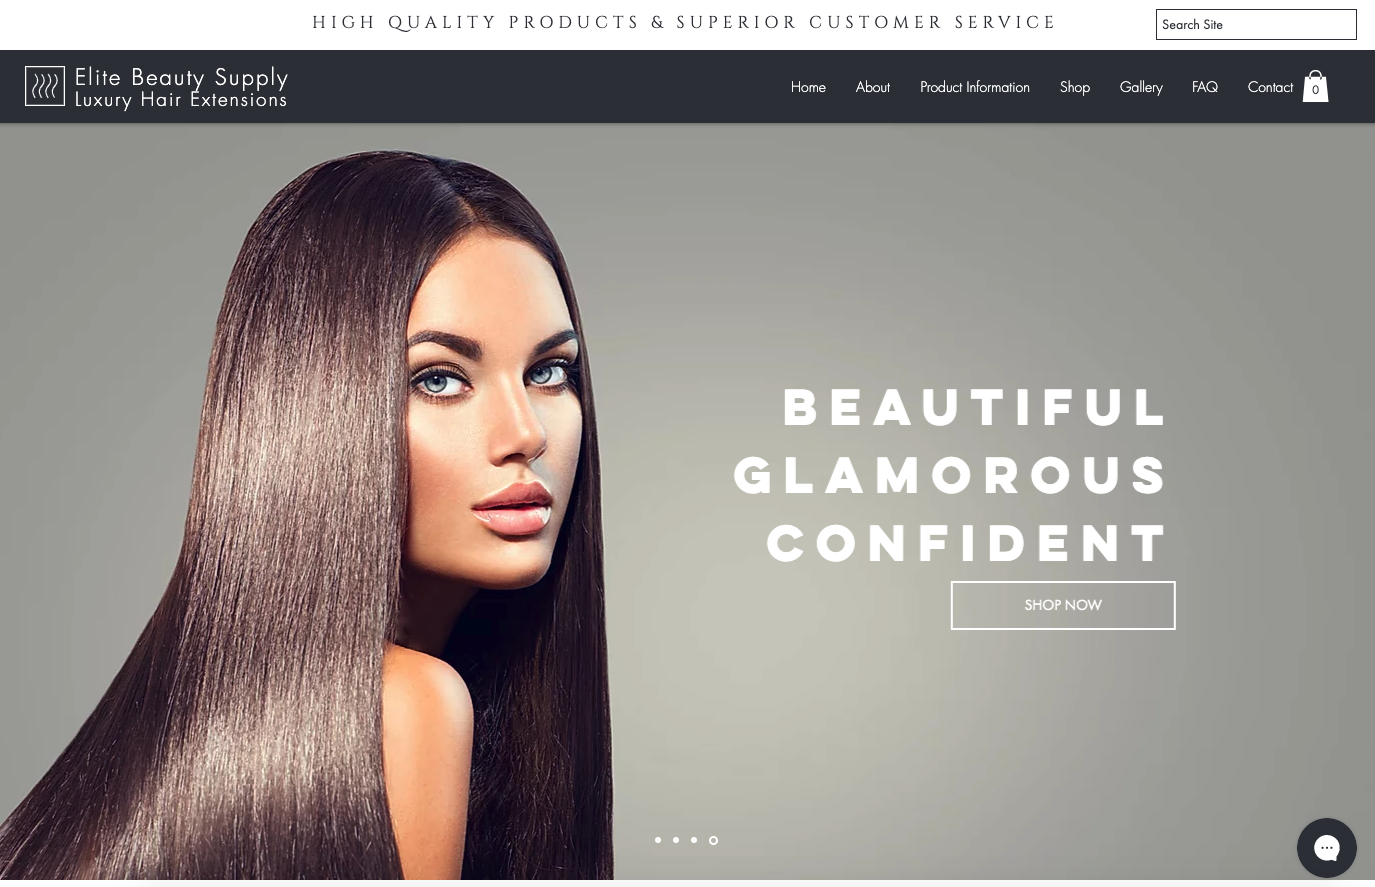 Elite Beauty Supply